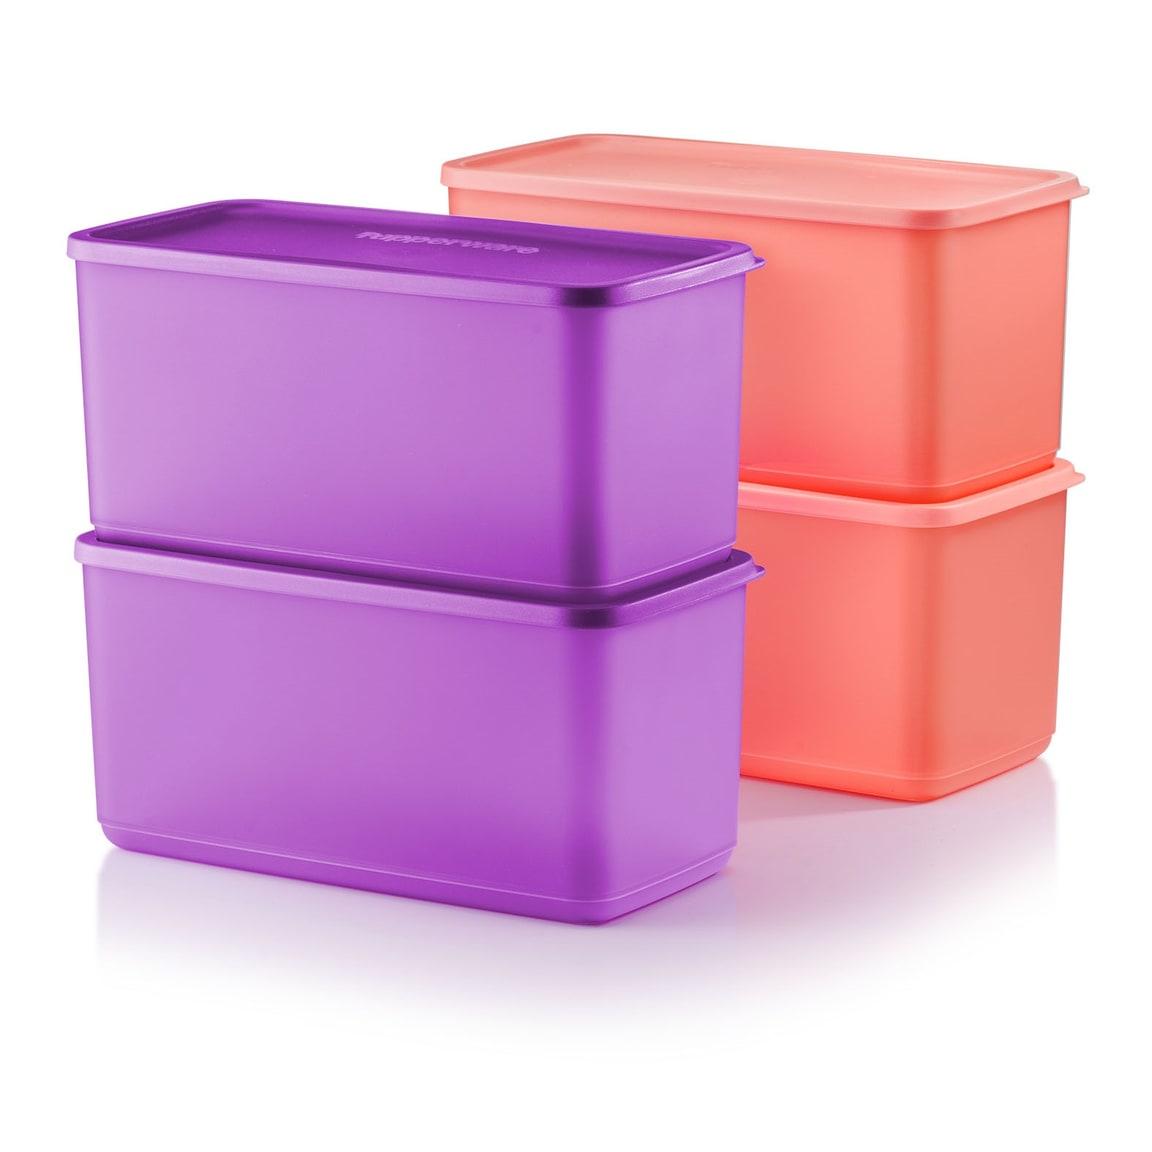 Big Box O' Freshness (4) 3.1L